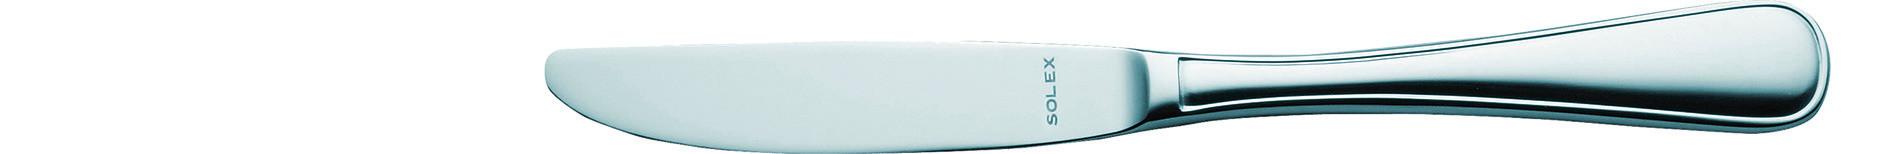 Selina, Menümesser Monoblock 225 mm